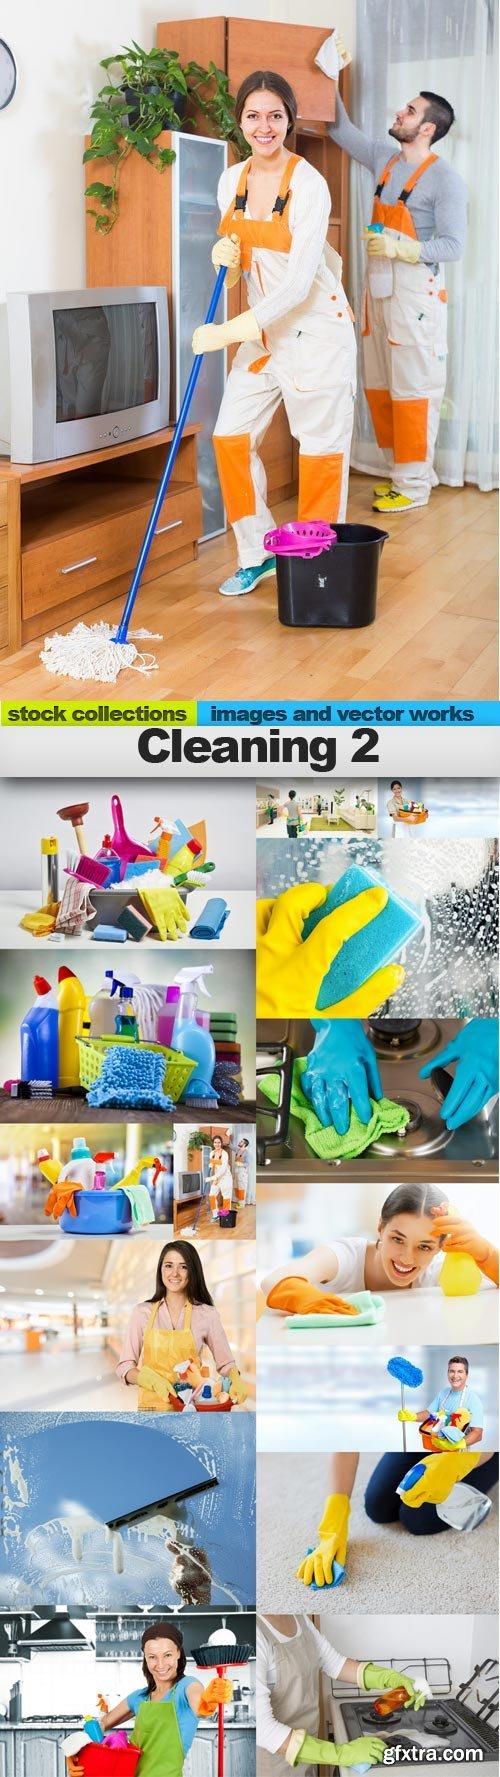 Cleaning 2, 15 x UHQ JPEG